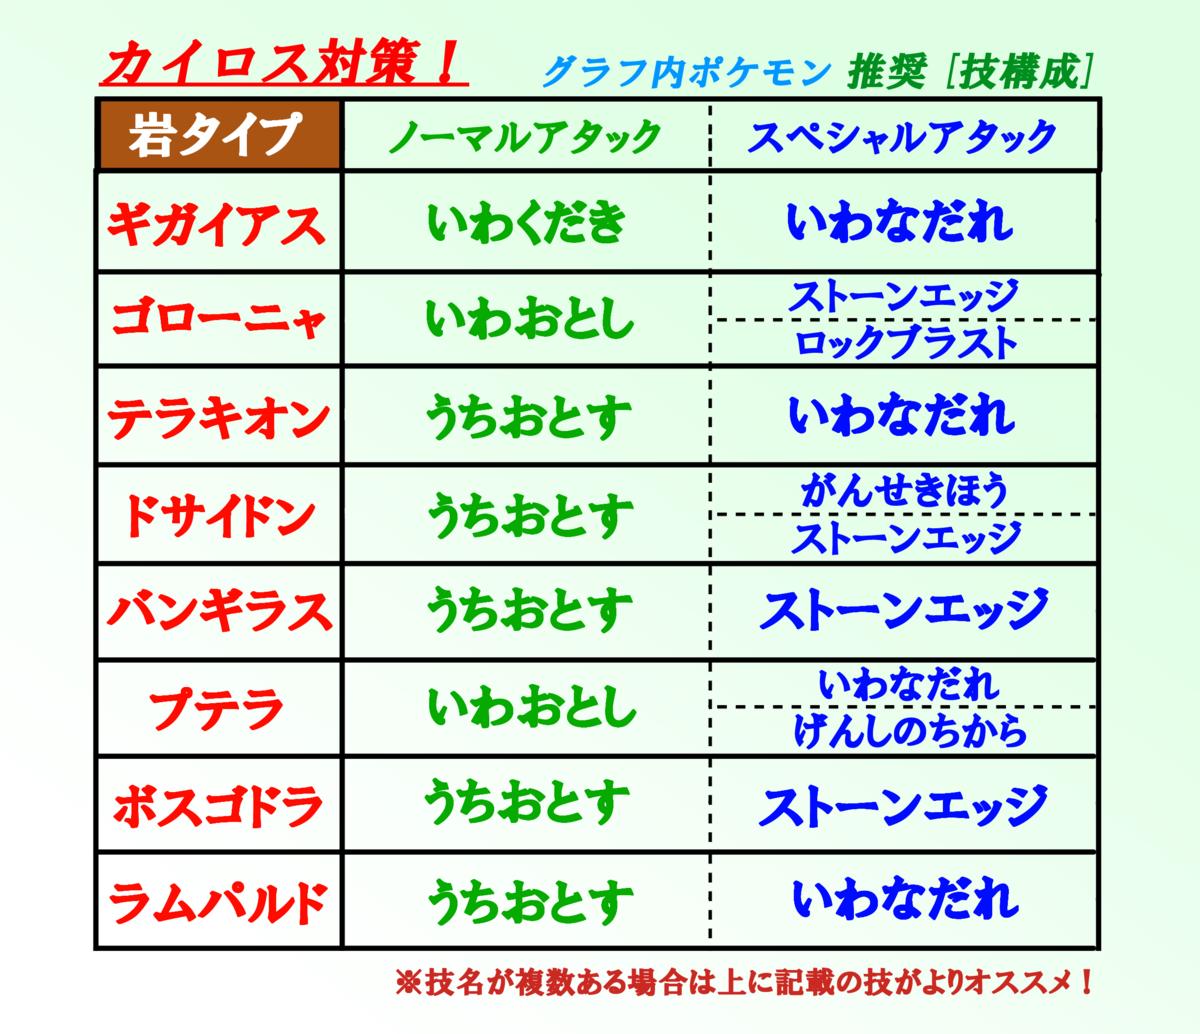 f:id:Kazumin0331:20200623121157p:plain